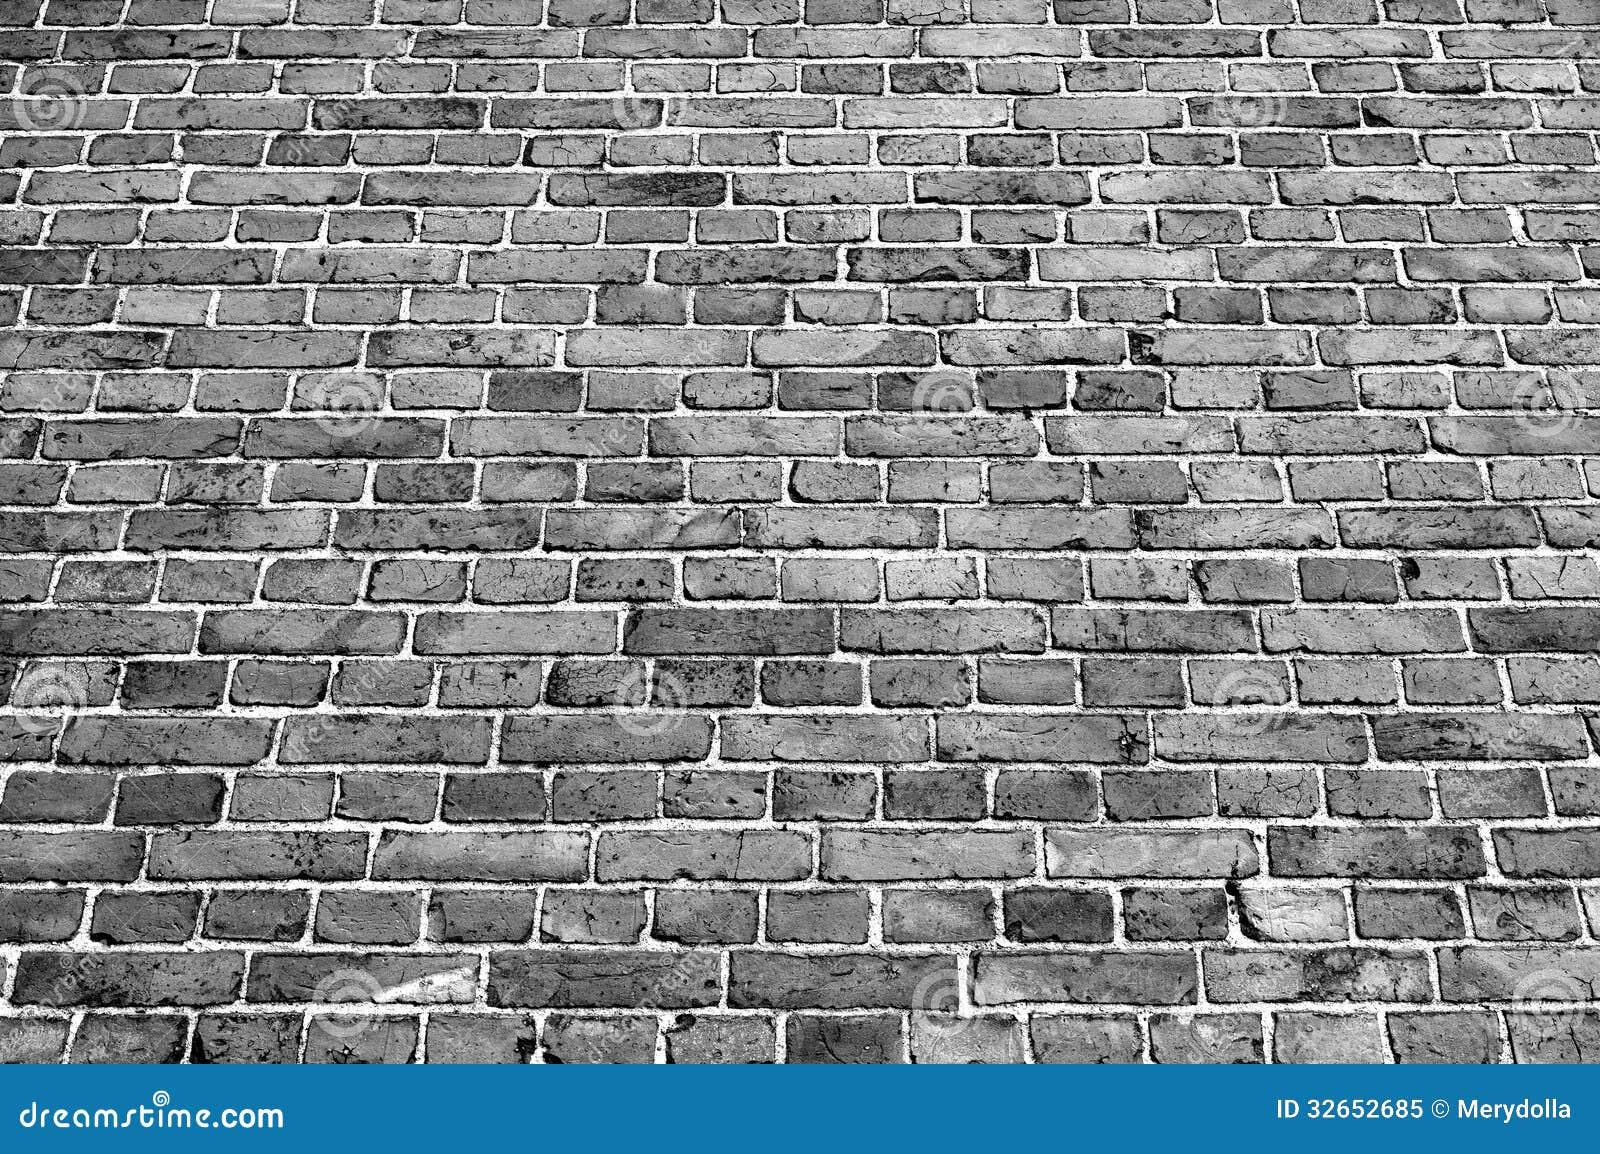 Brick Wall Background Royalty Free Stock Photo Image